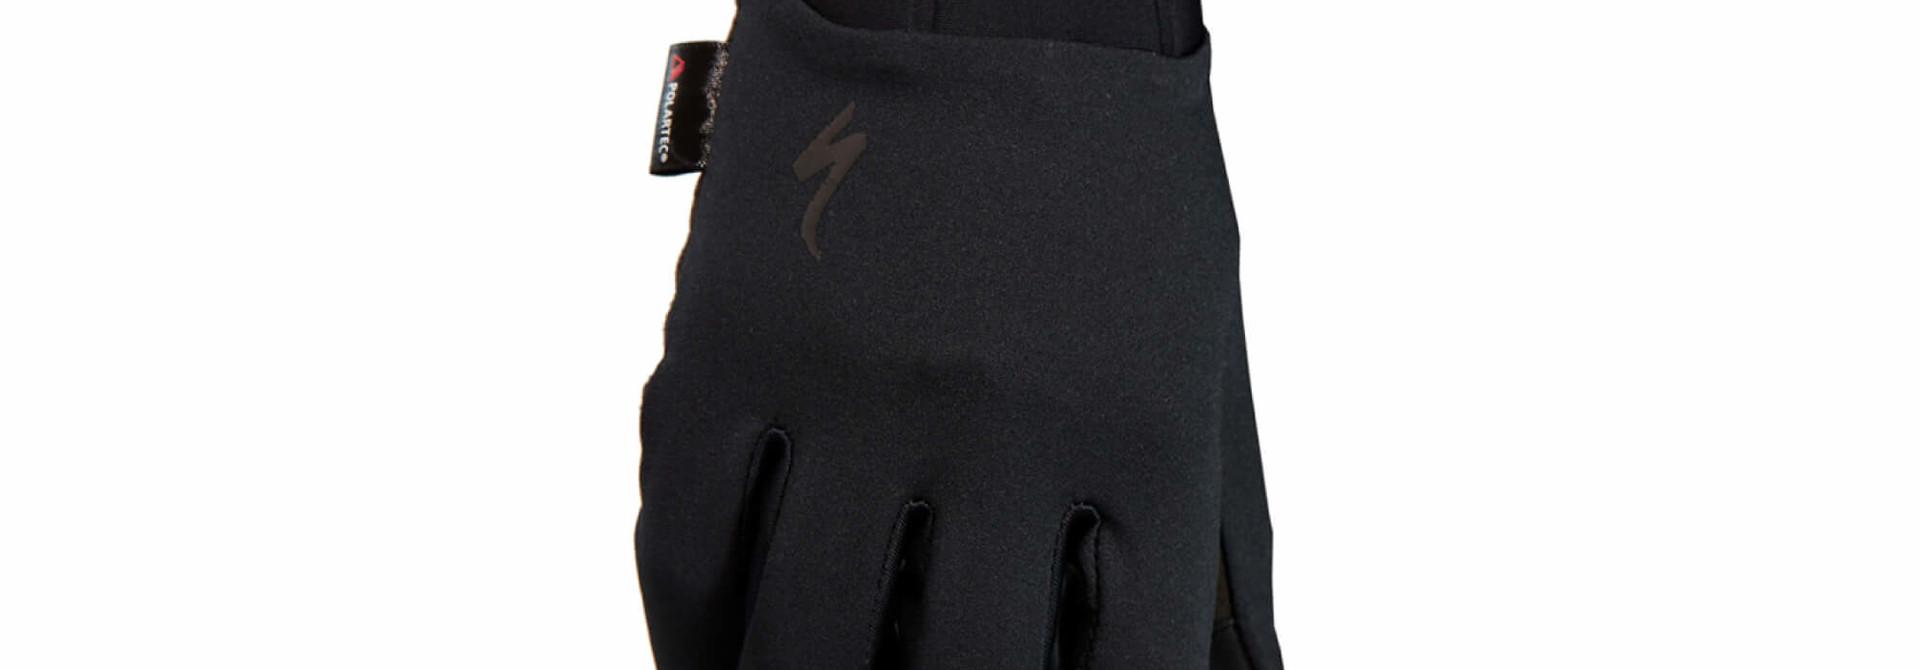 Prime-Series Thermal Glove Women